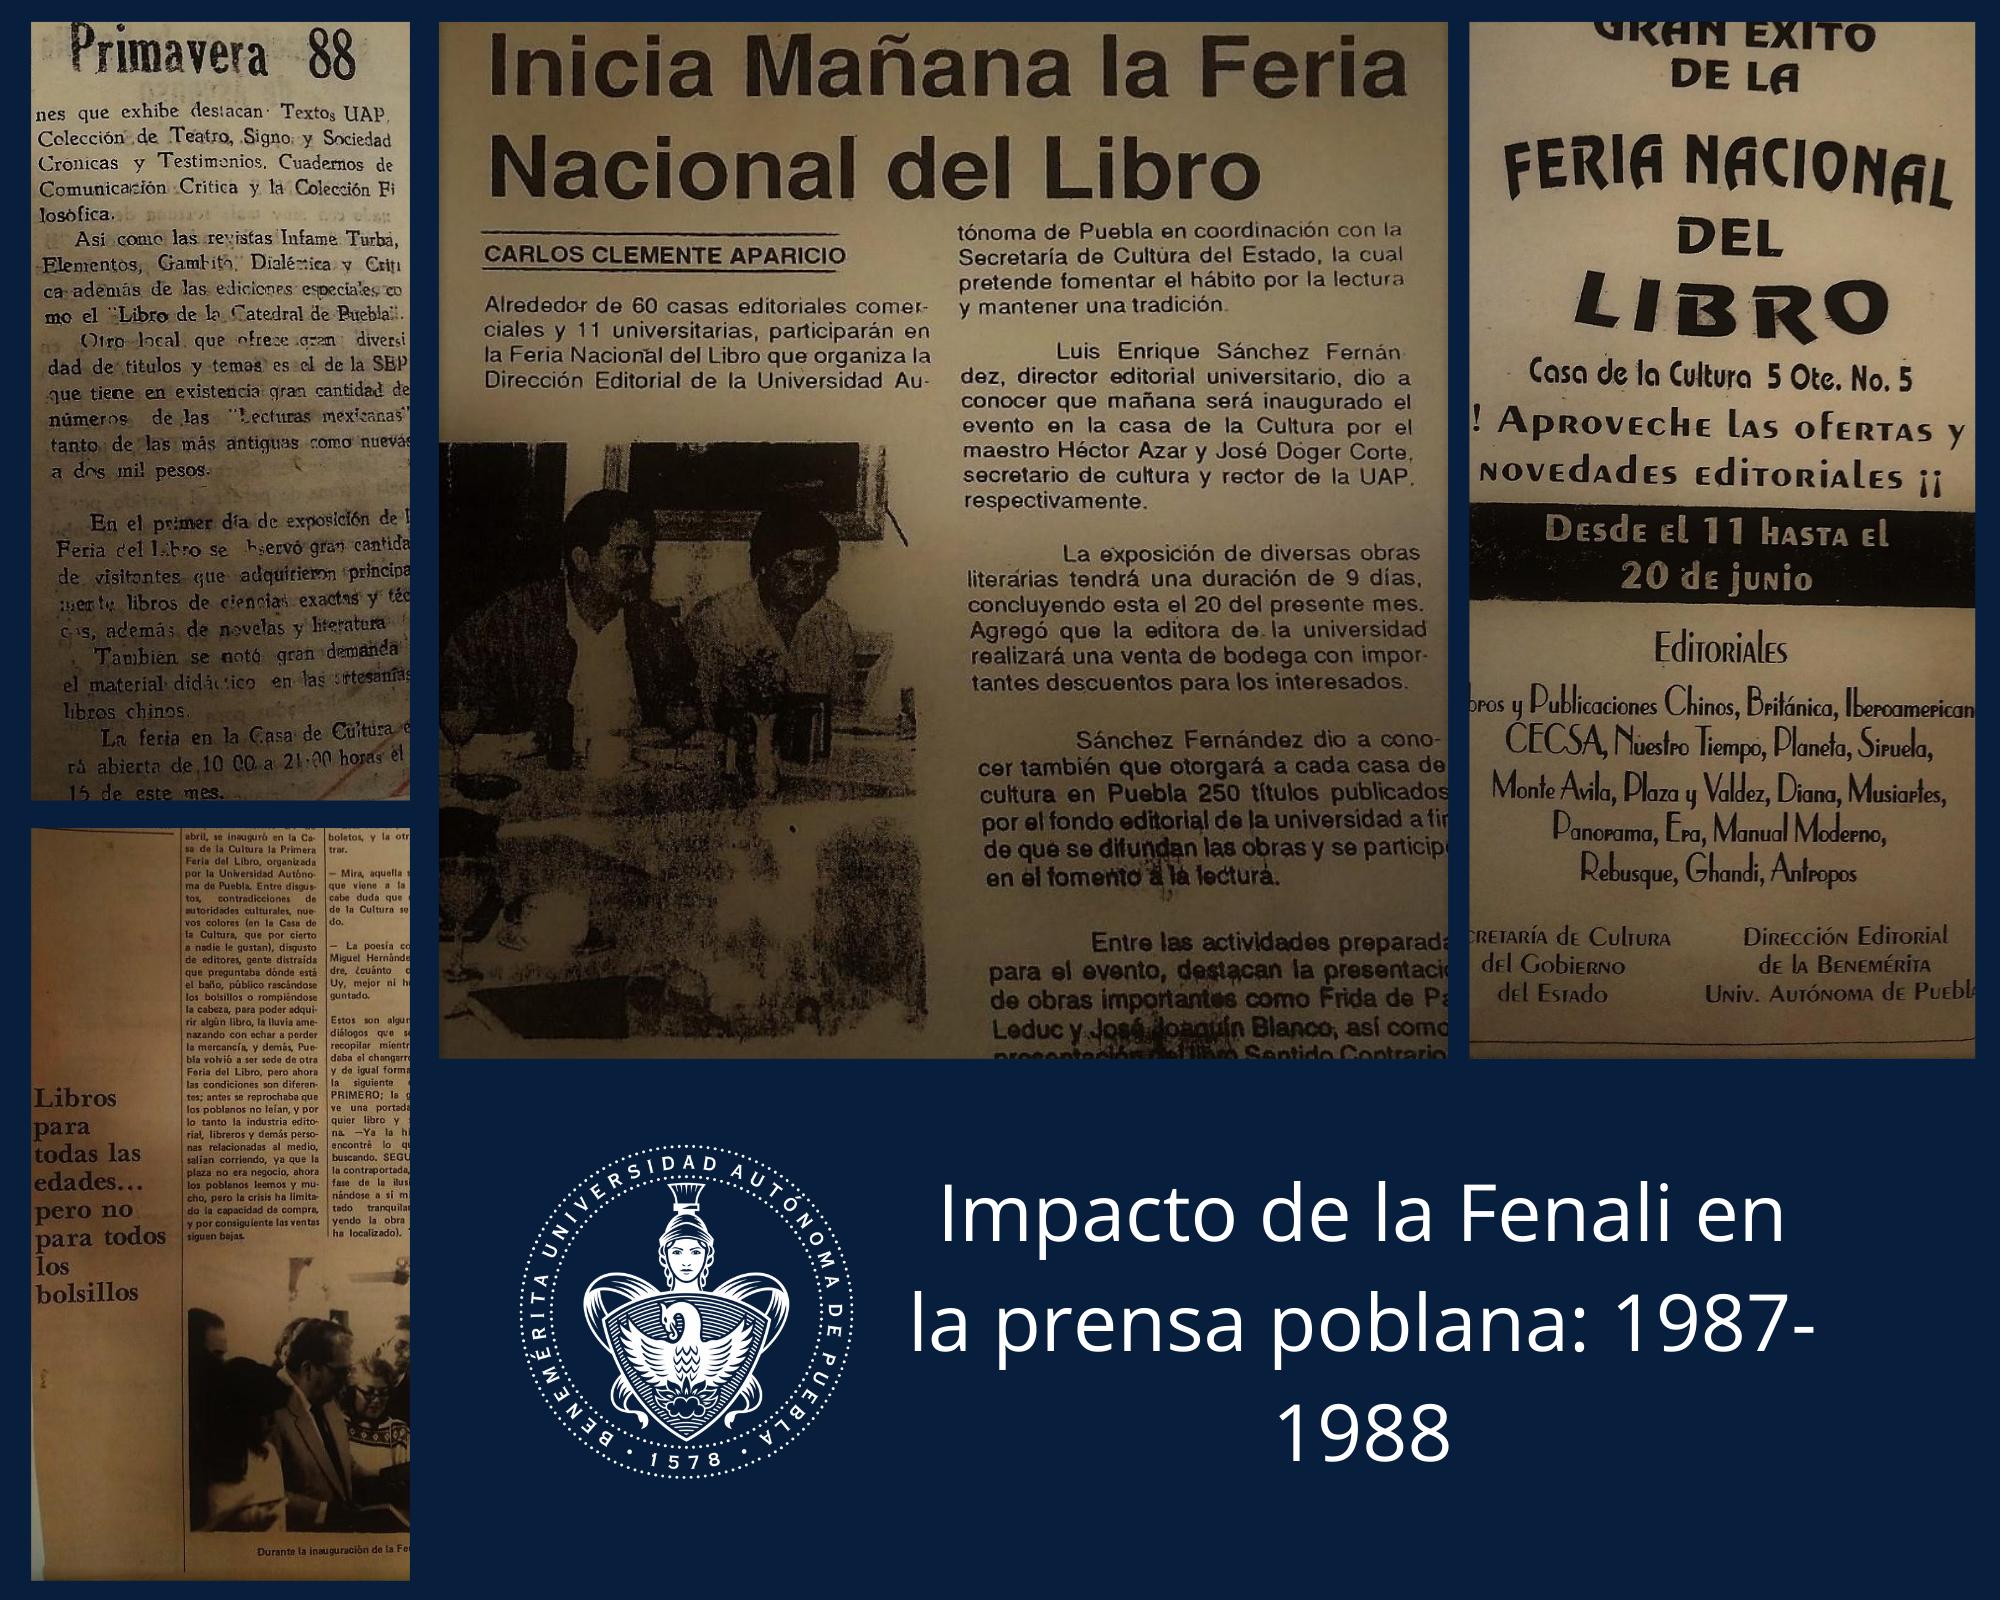 Historia Feria Nacional del Libro BUAP